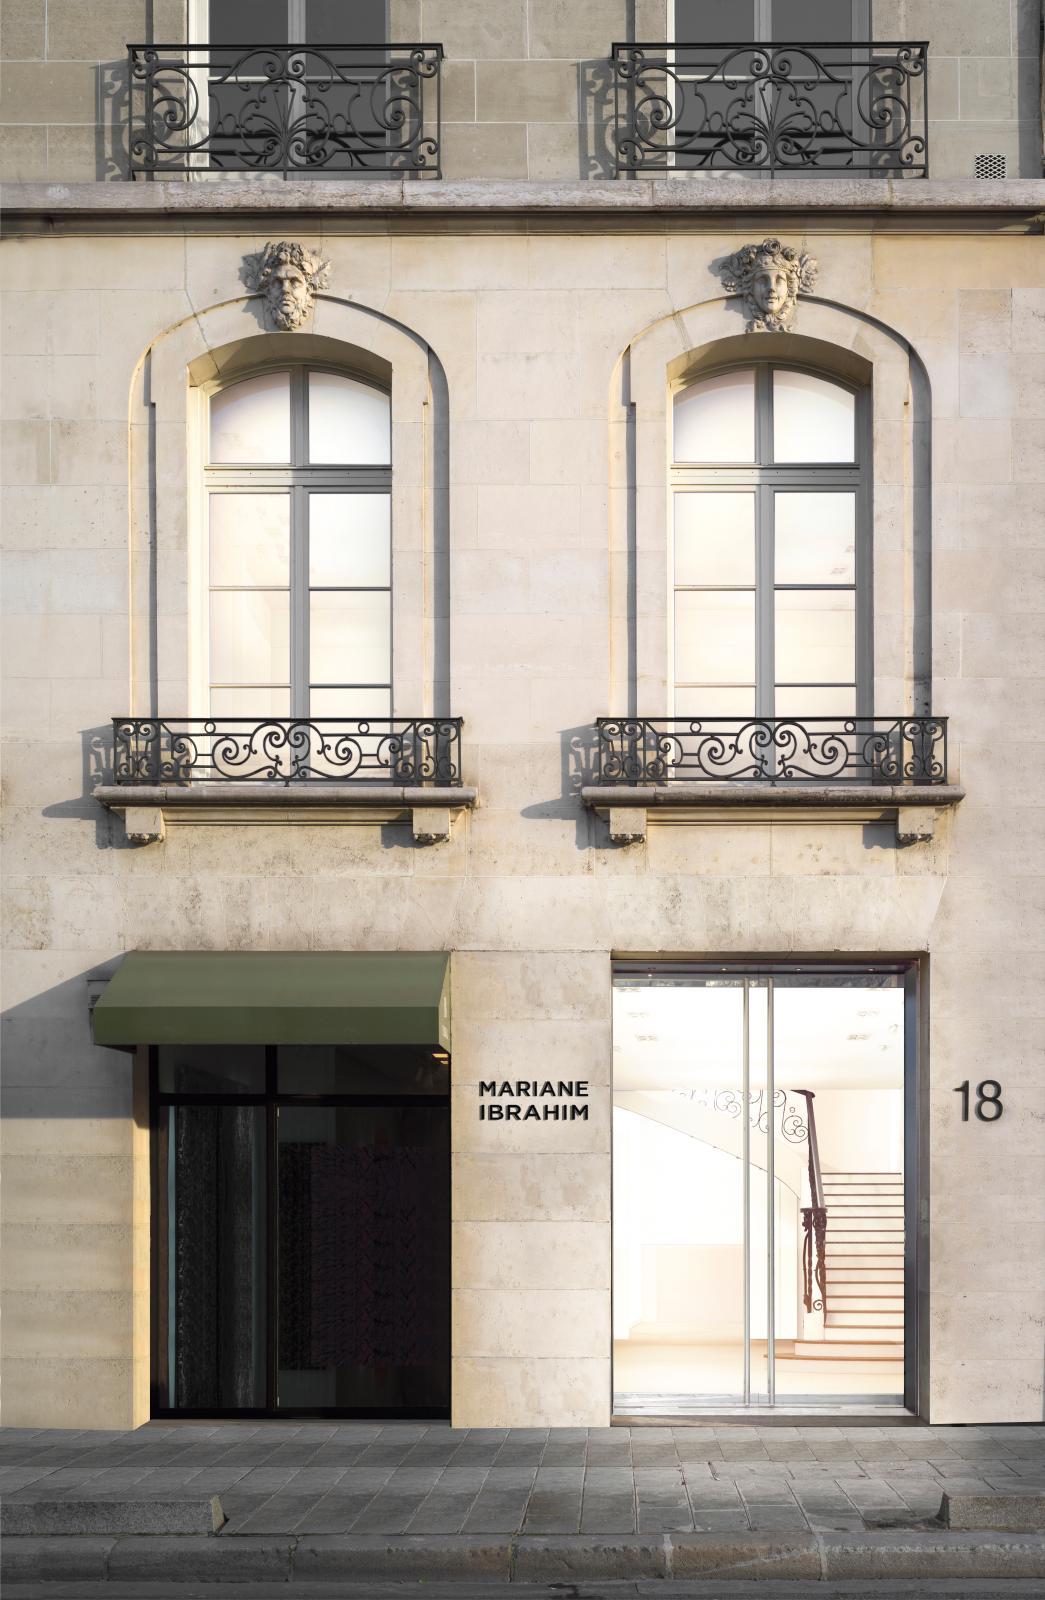 La galerie Mariane Ibrahim sur l'avenue Matignon.Courtesy Mariane Ibrahim